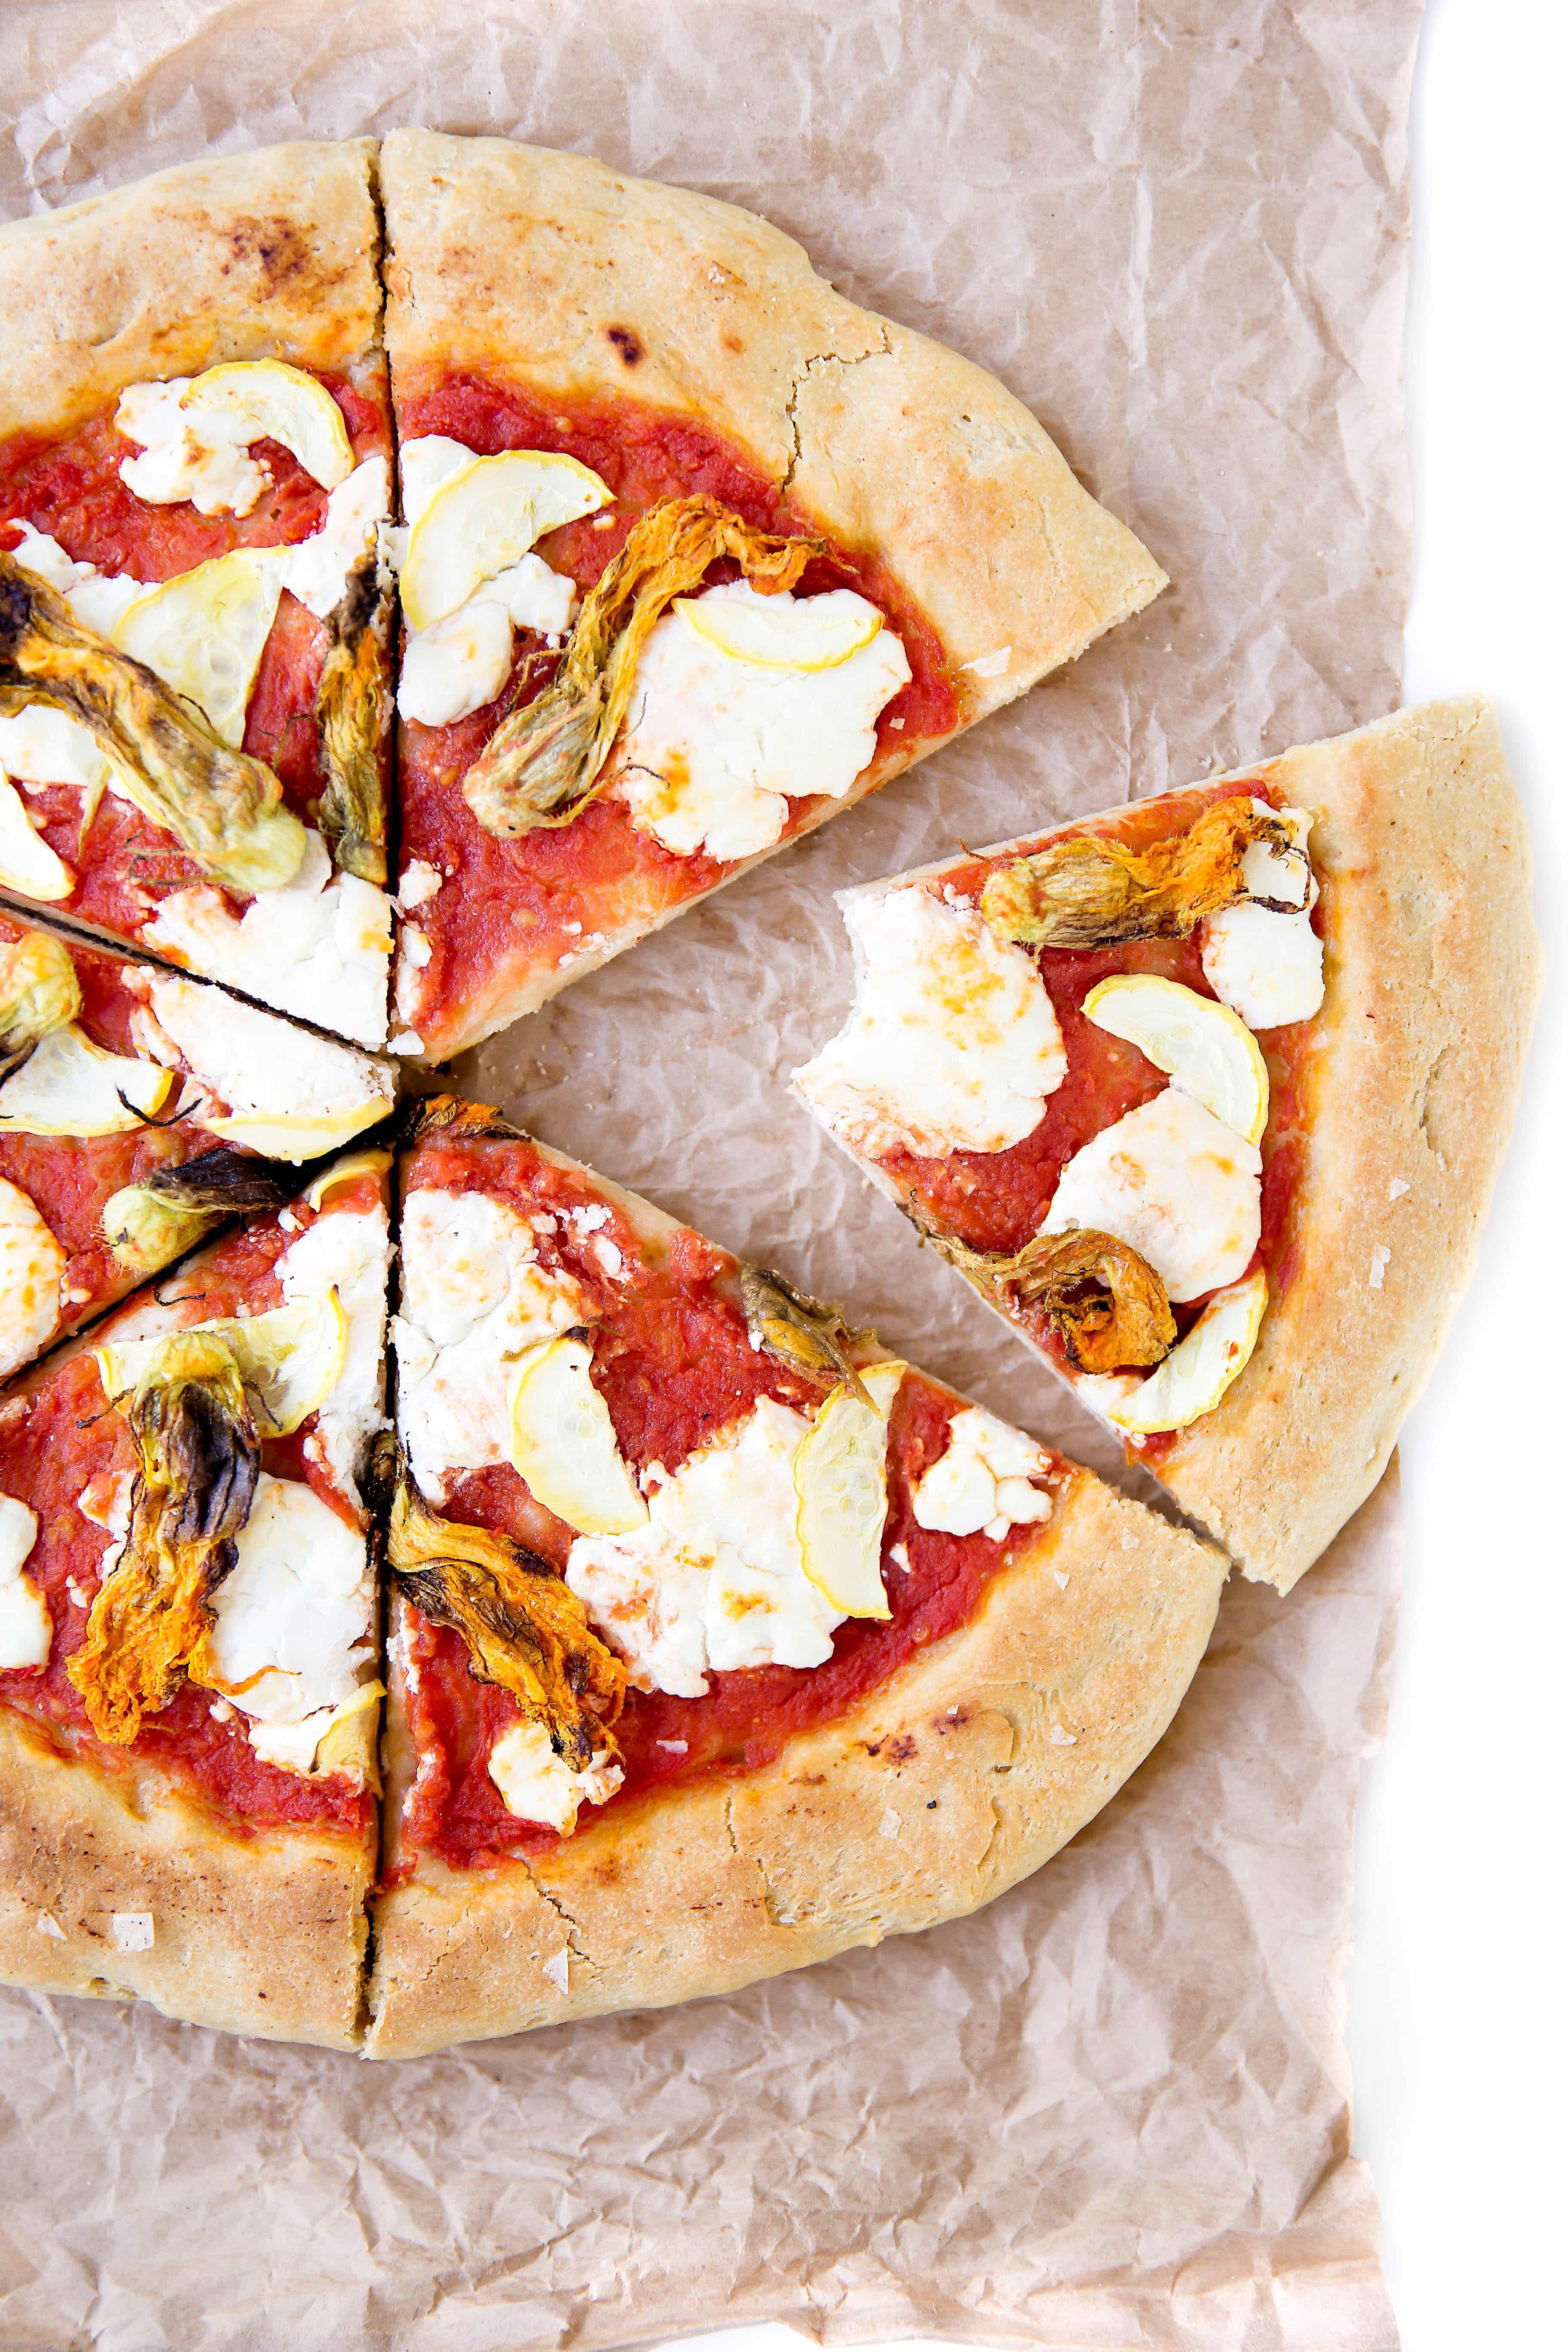 Squash Blossom Pizza - Broma Bakery